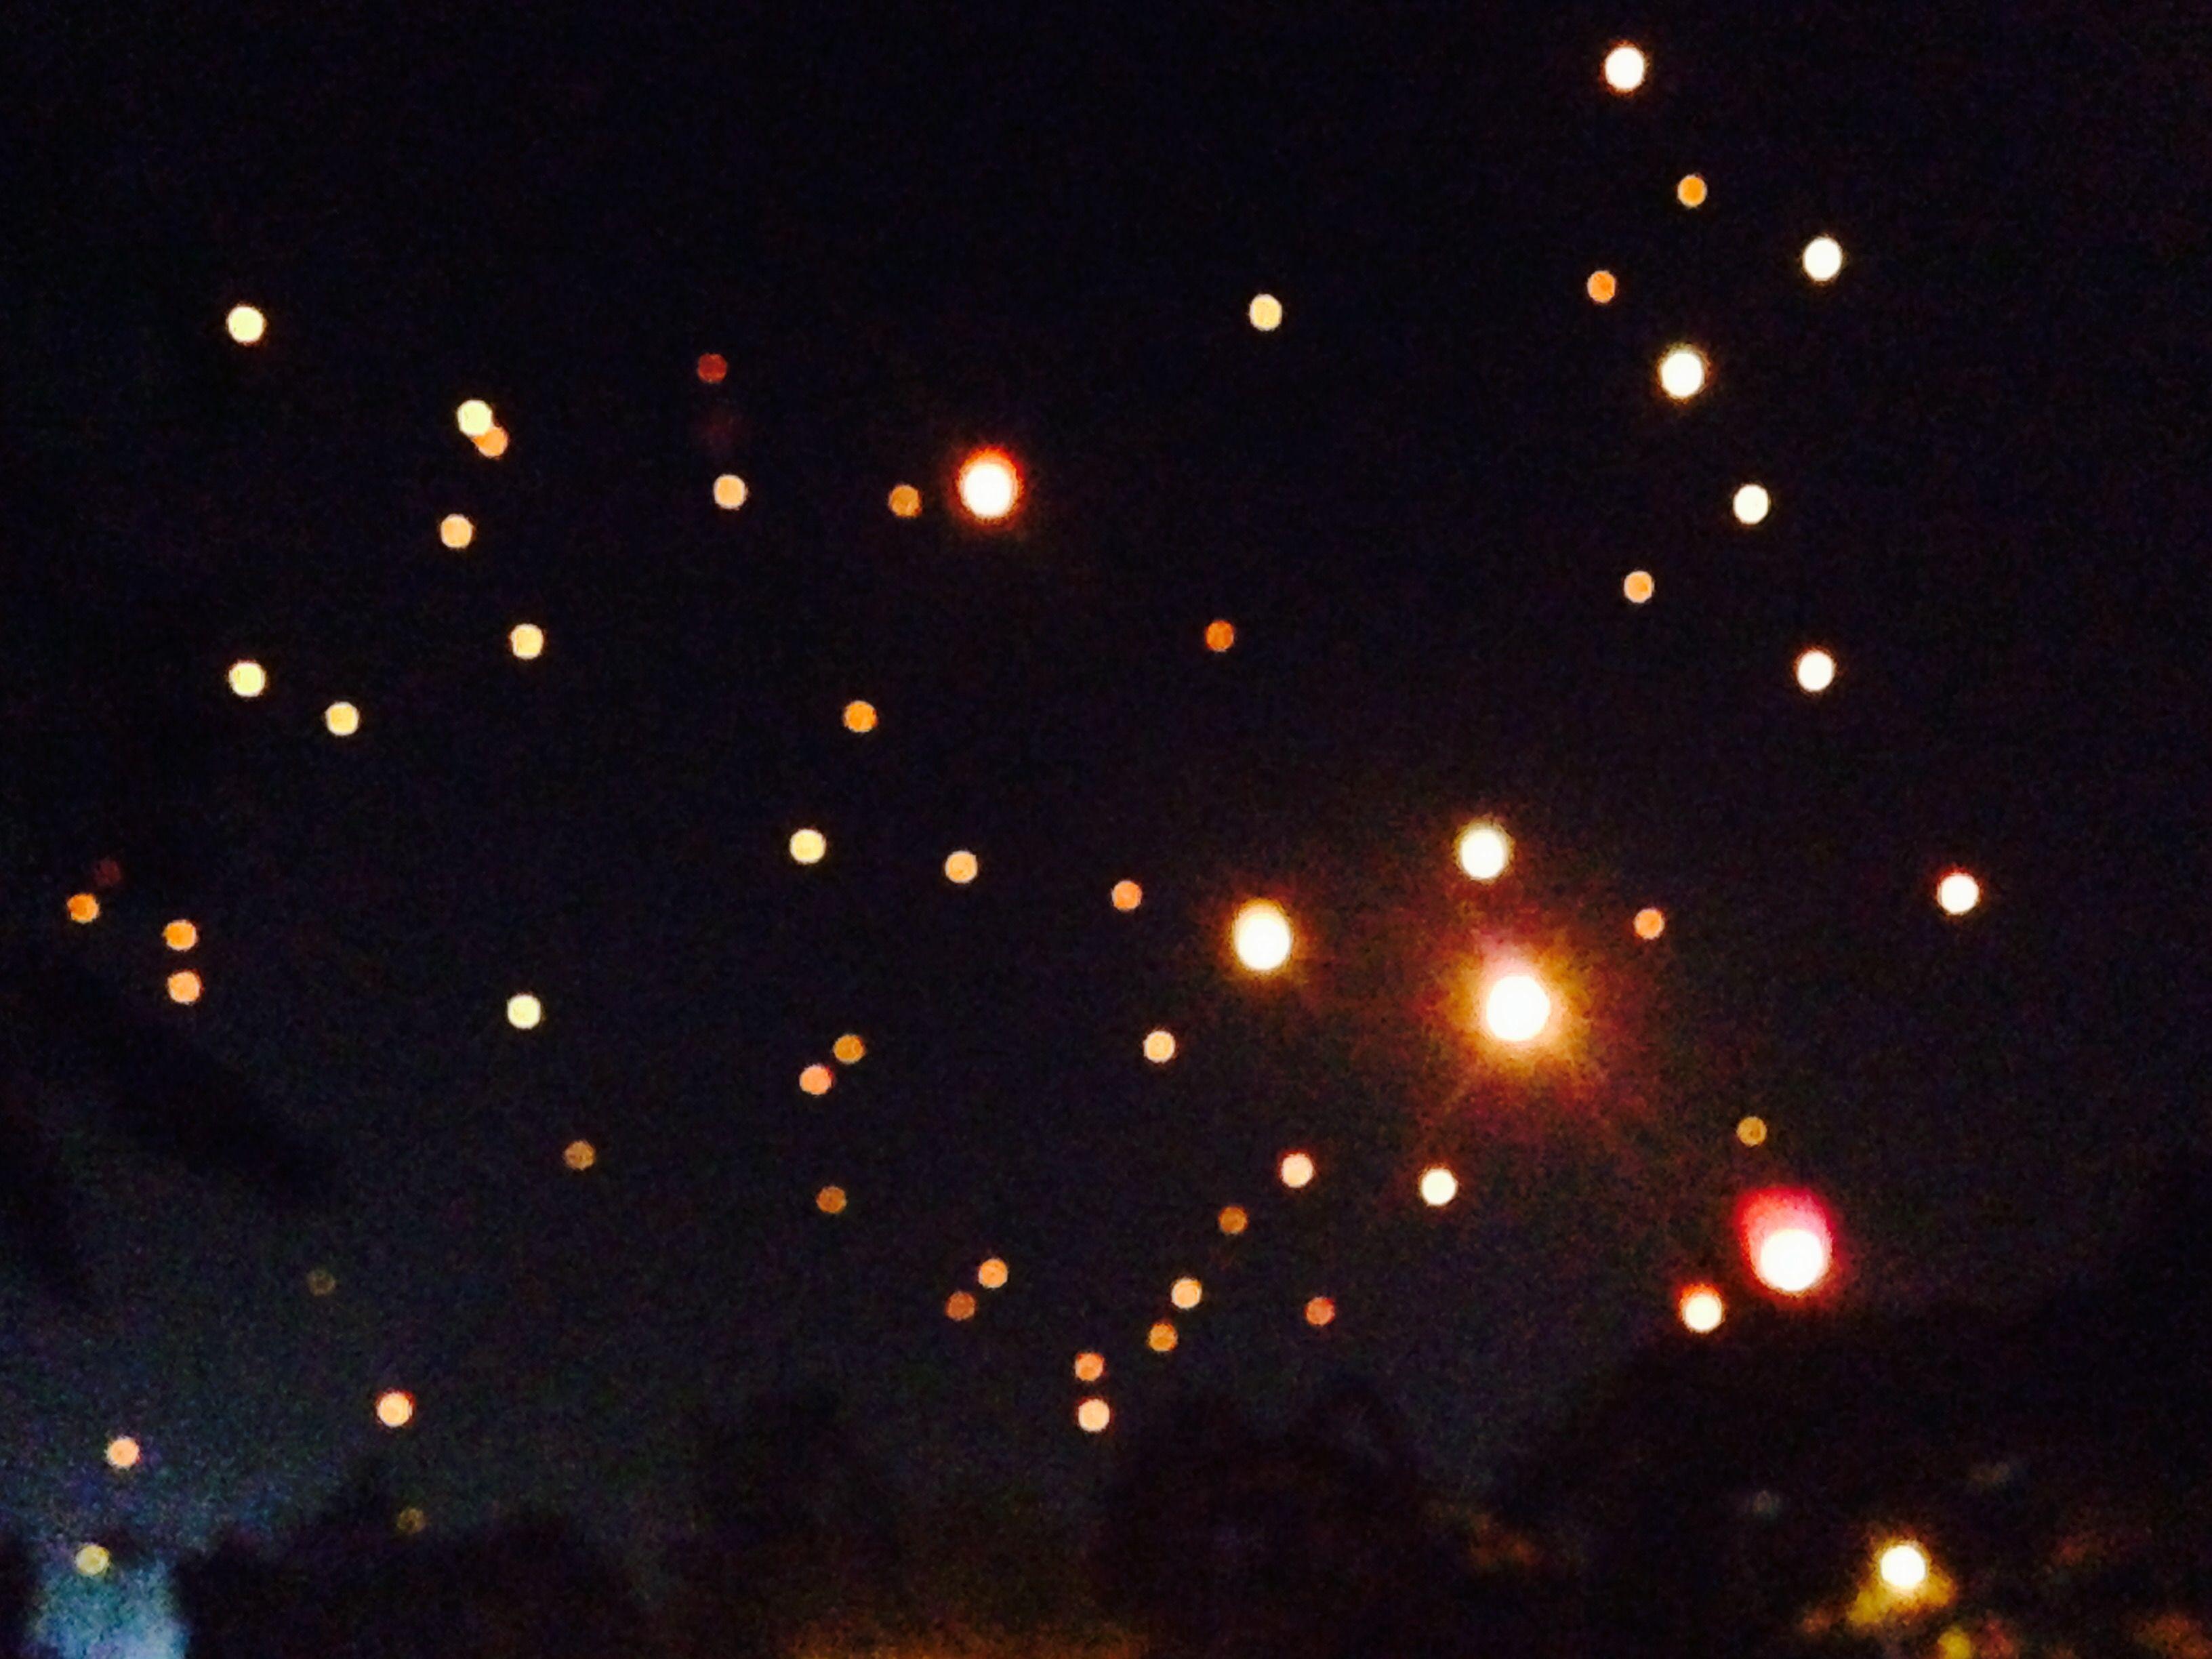 Diwali bokeh in India  Skylight Sky full of stars Pune Sarasbaug Lit